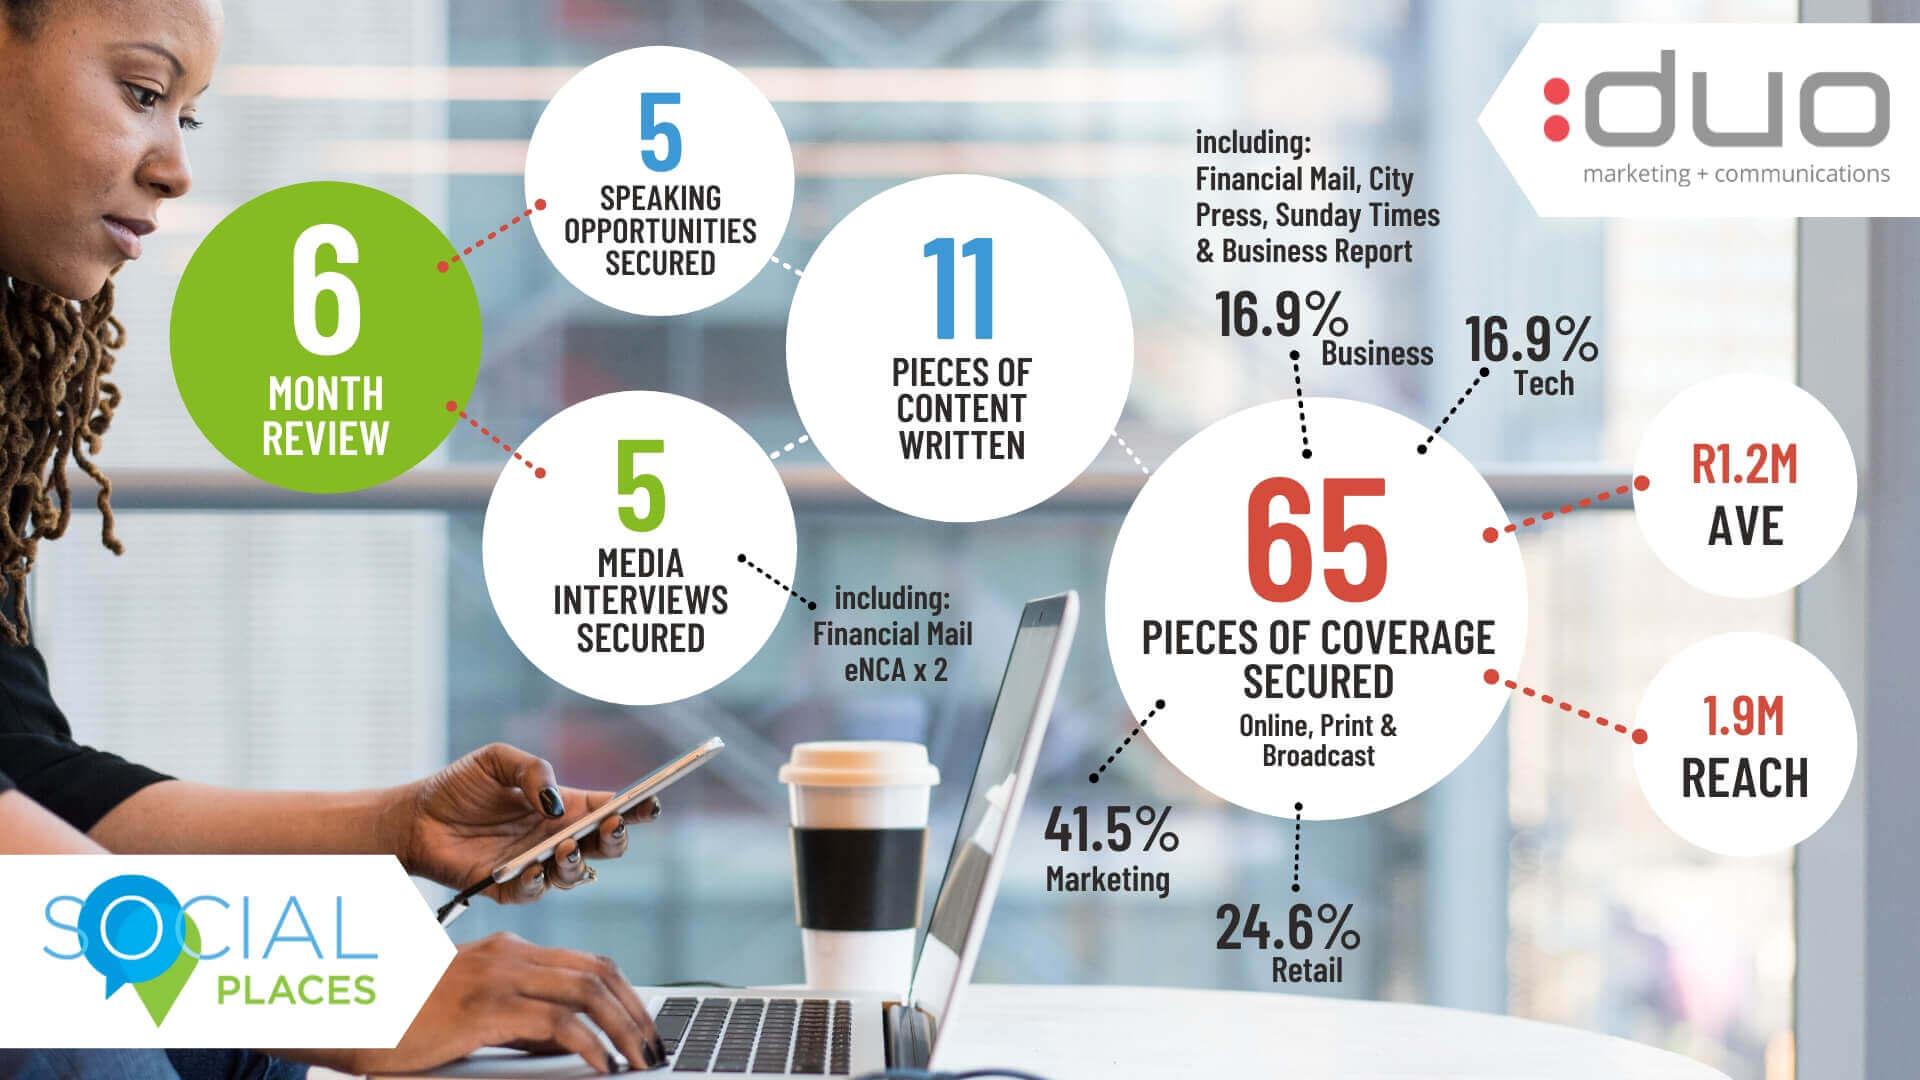 Social Places case study infographic